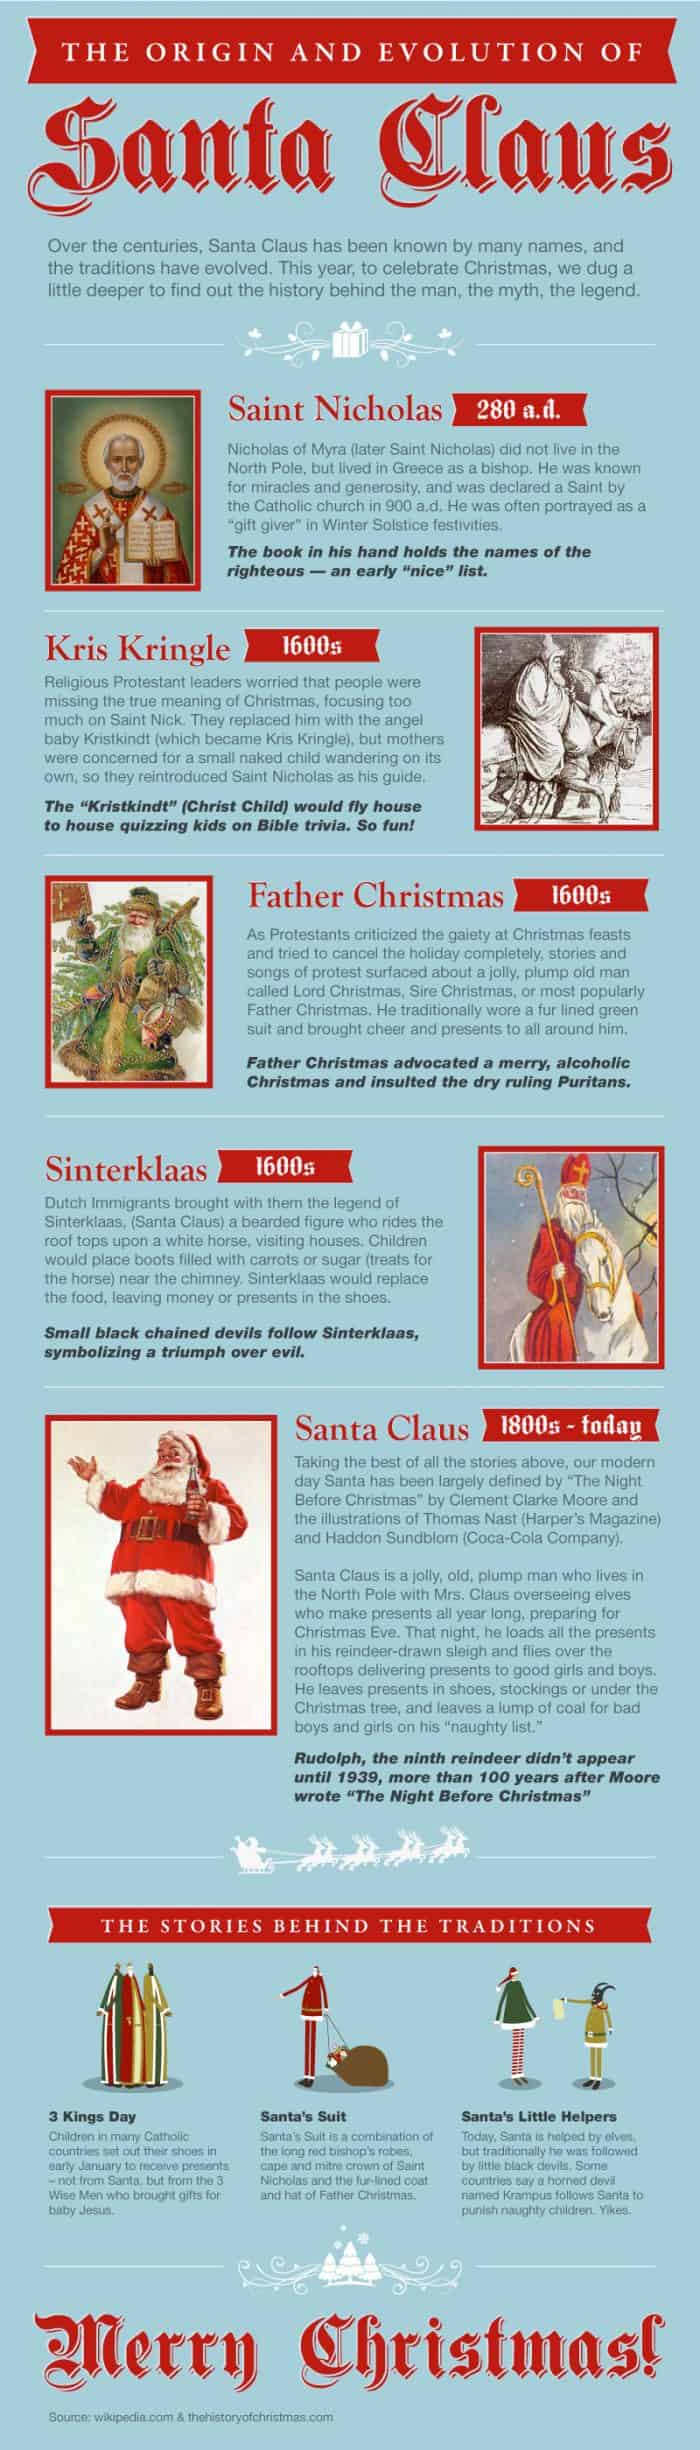 Origin and Evolution of Santa Claus Infographic